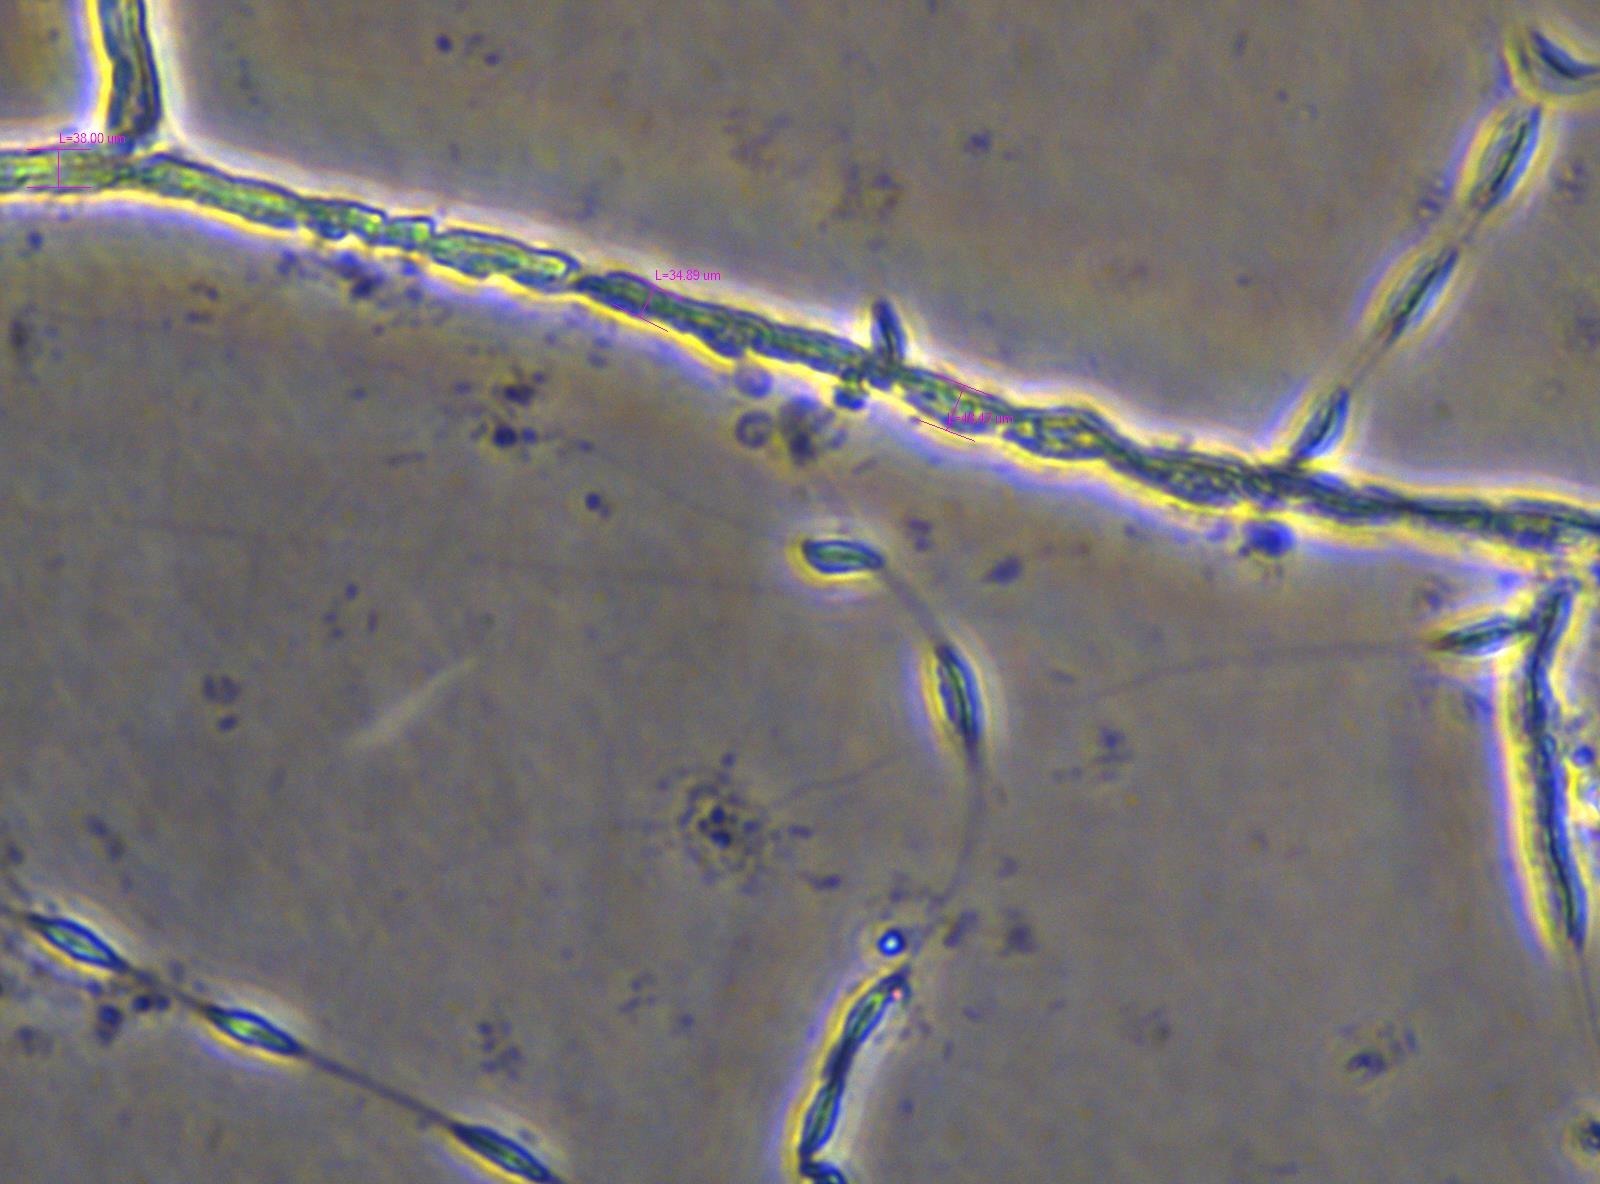 Copy of 01-21-19 JR hom moon adult thick traintracks 40X Plate 1.jpg